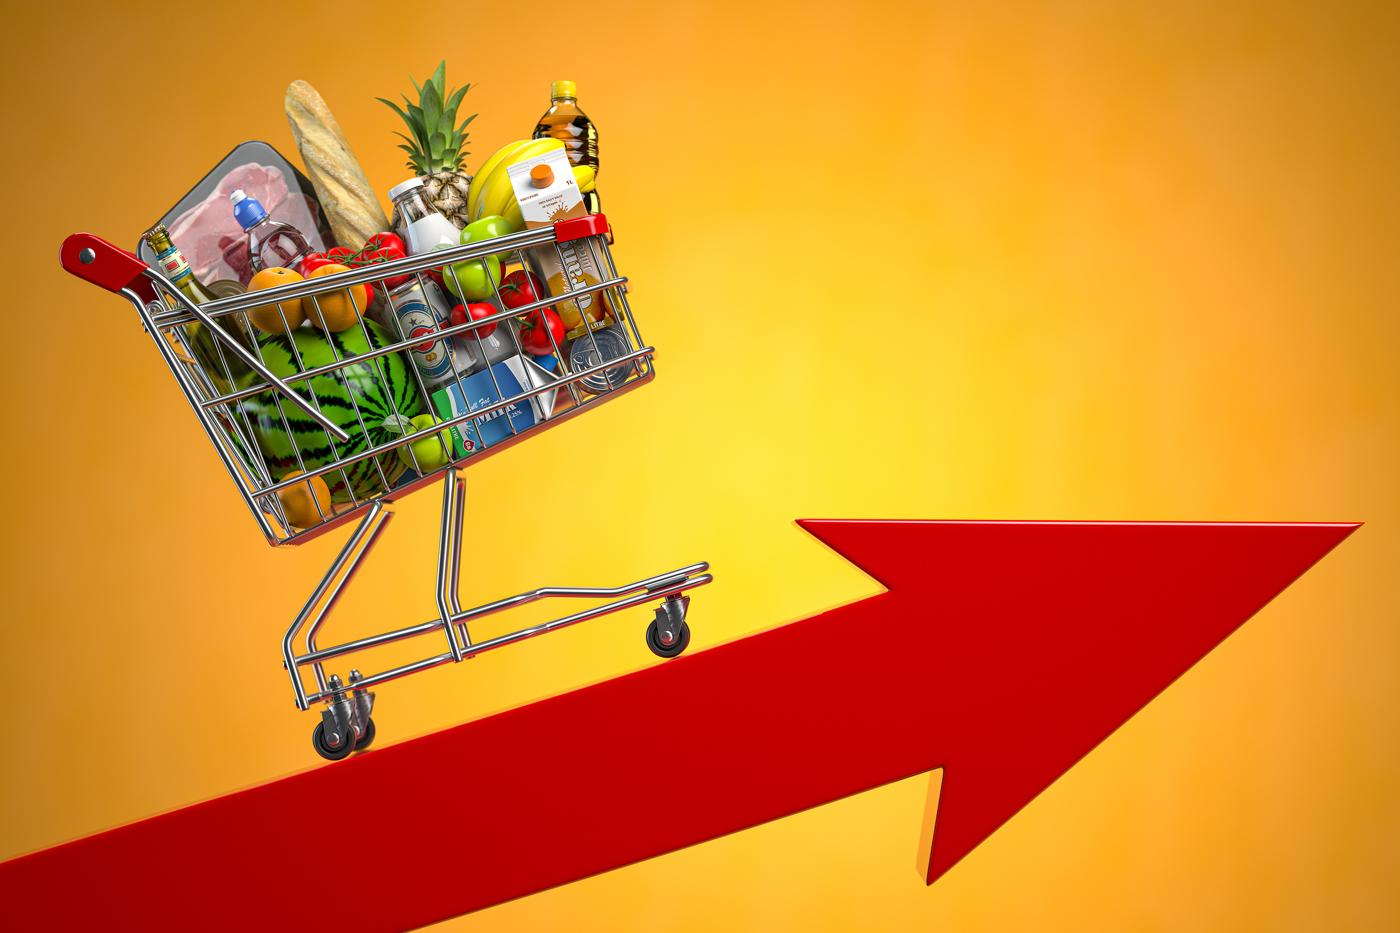 Grocery stocks, grocery store stocks, supermarket stocks